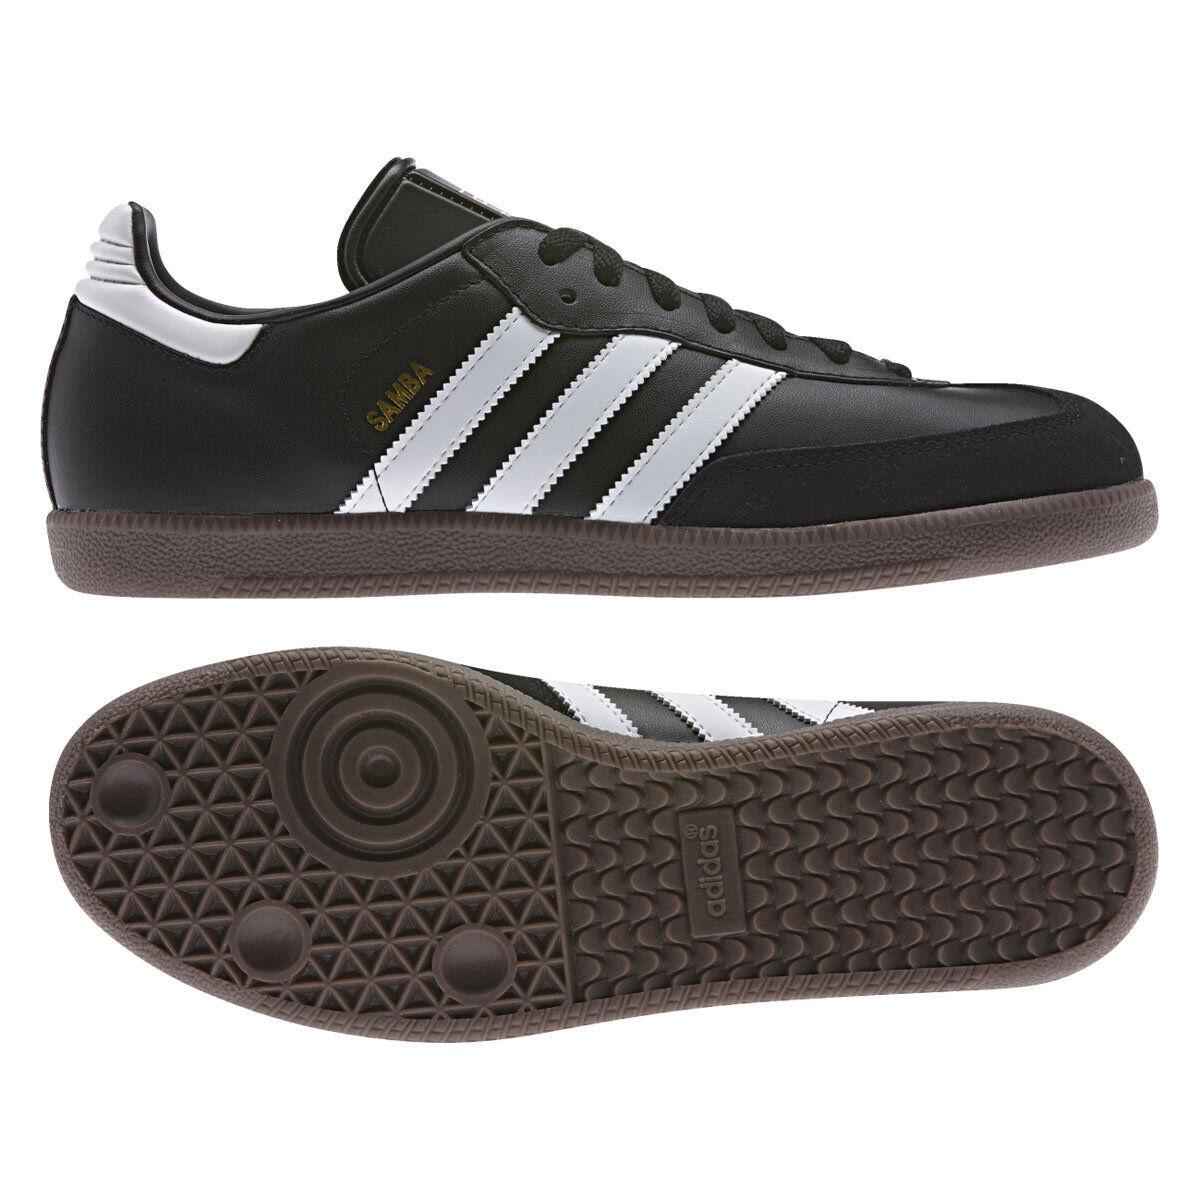 Adidas samba 2017 calcetines cortos zapato deportivo pasillos botas de fútbol 019000